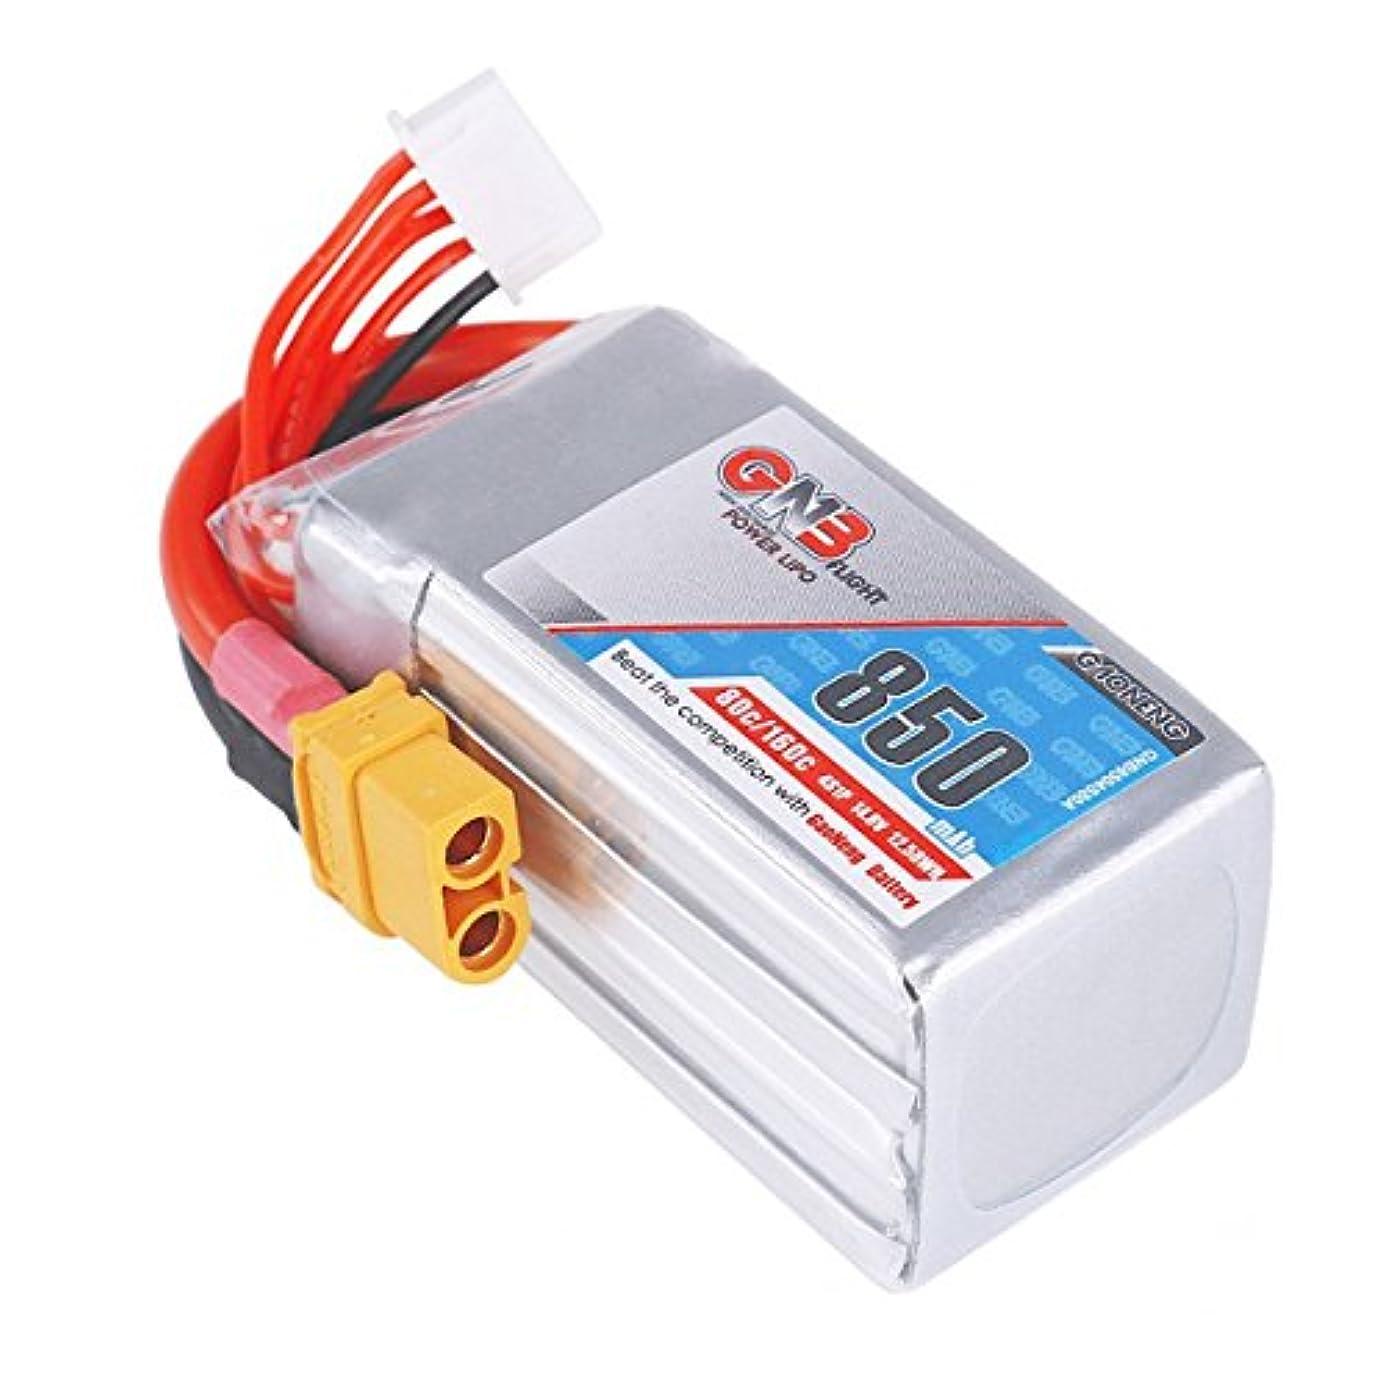 Gaoneng 850mAh LiPo Battery 4S 80C 14.8V XT60 Connector for FPV Racing Drone